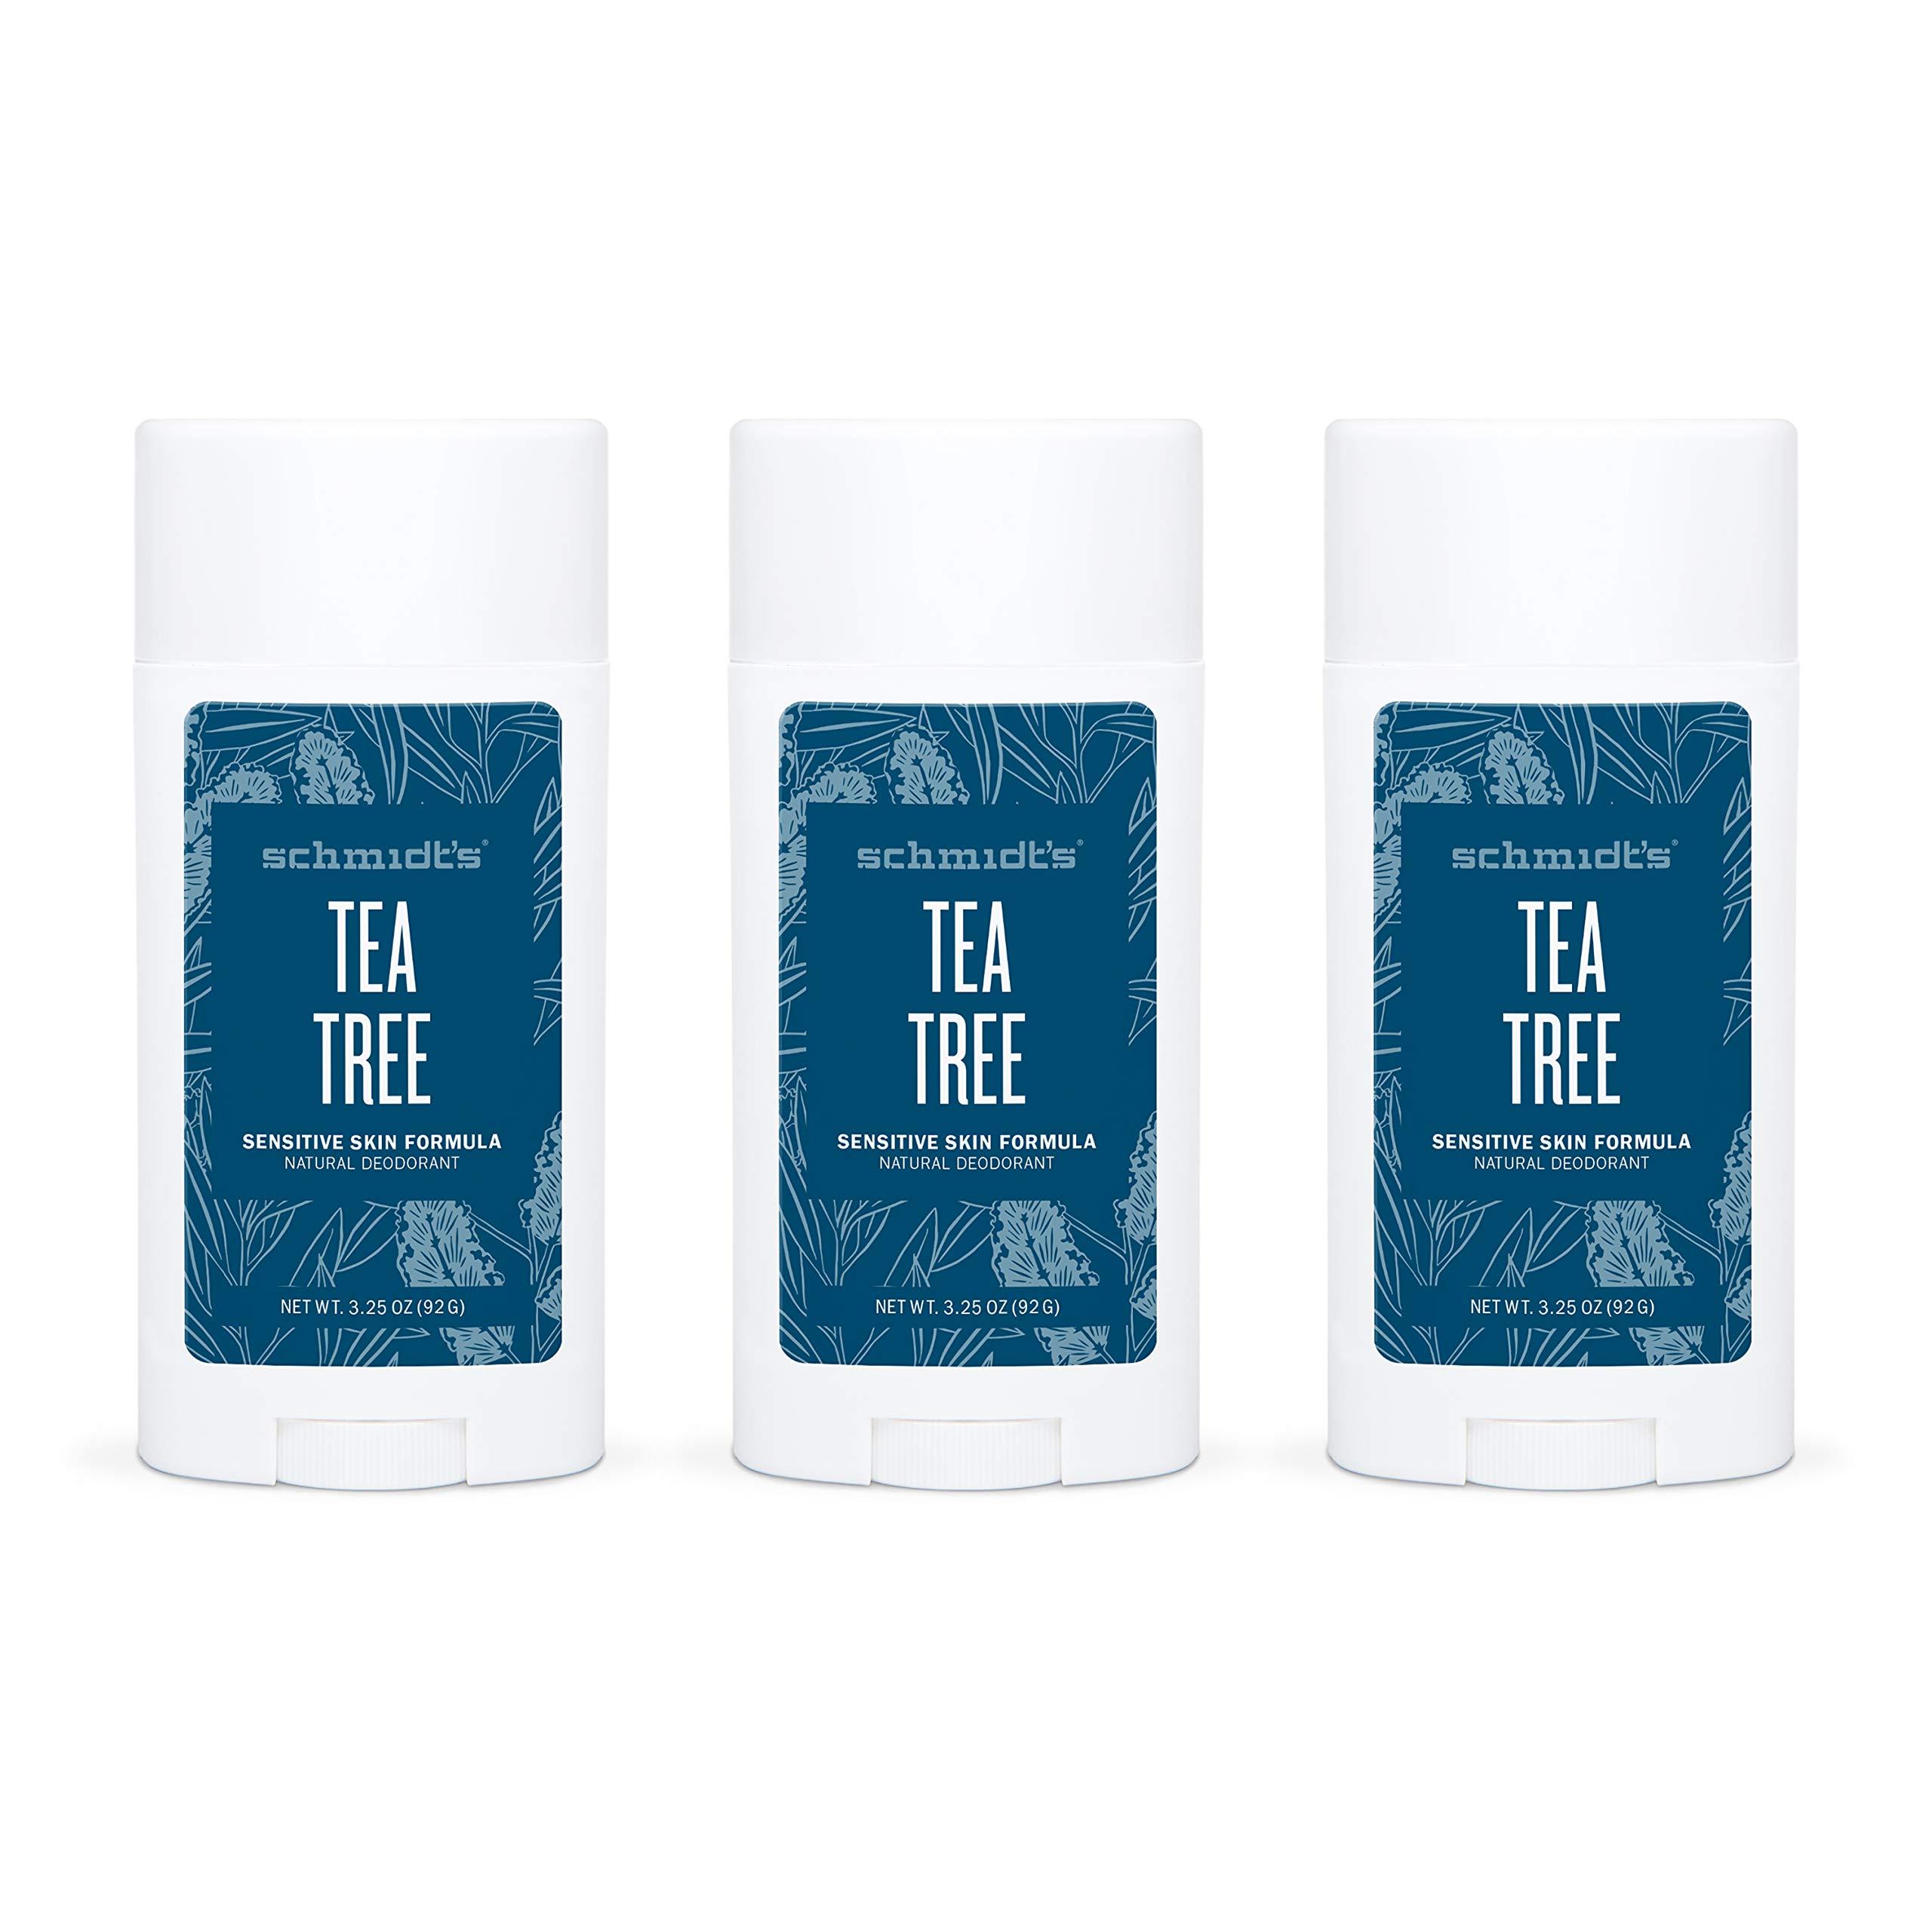 Schmidt's Aluminum Free Baking Soda-Free Sensitive Skin Natural Deodorant For 24 Hour Odor Protection and Freshness Tea Tree Vegan, Certified Cruelty Free, 3.25 oz Pack of 3